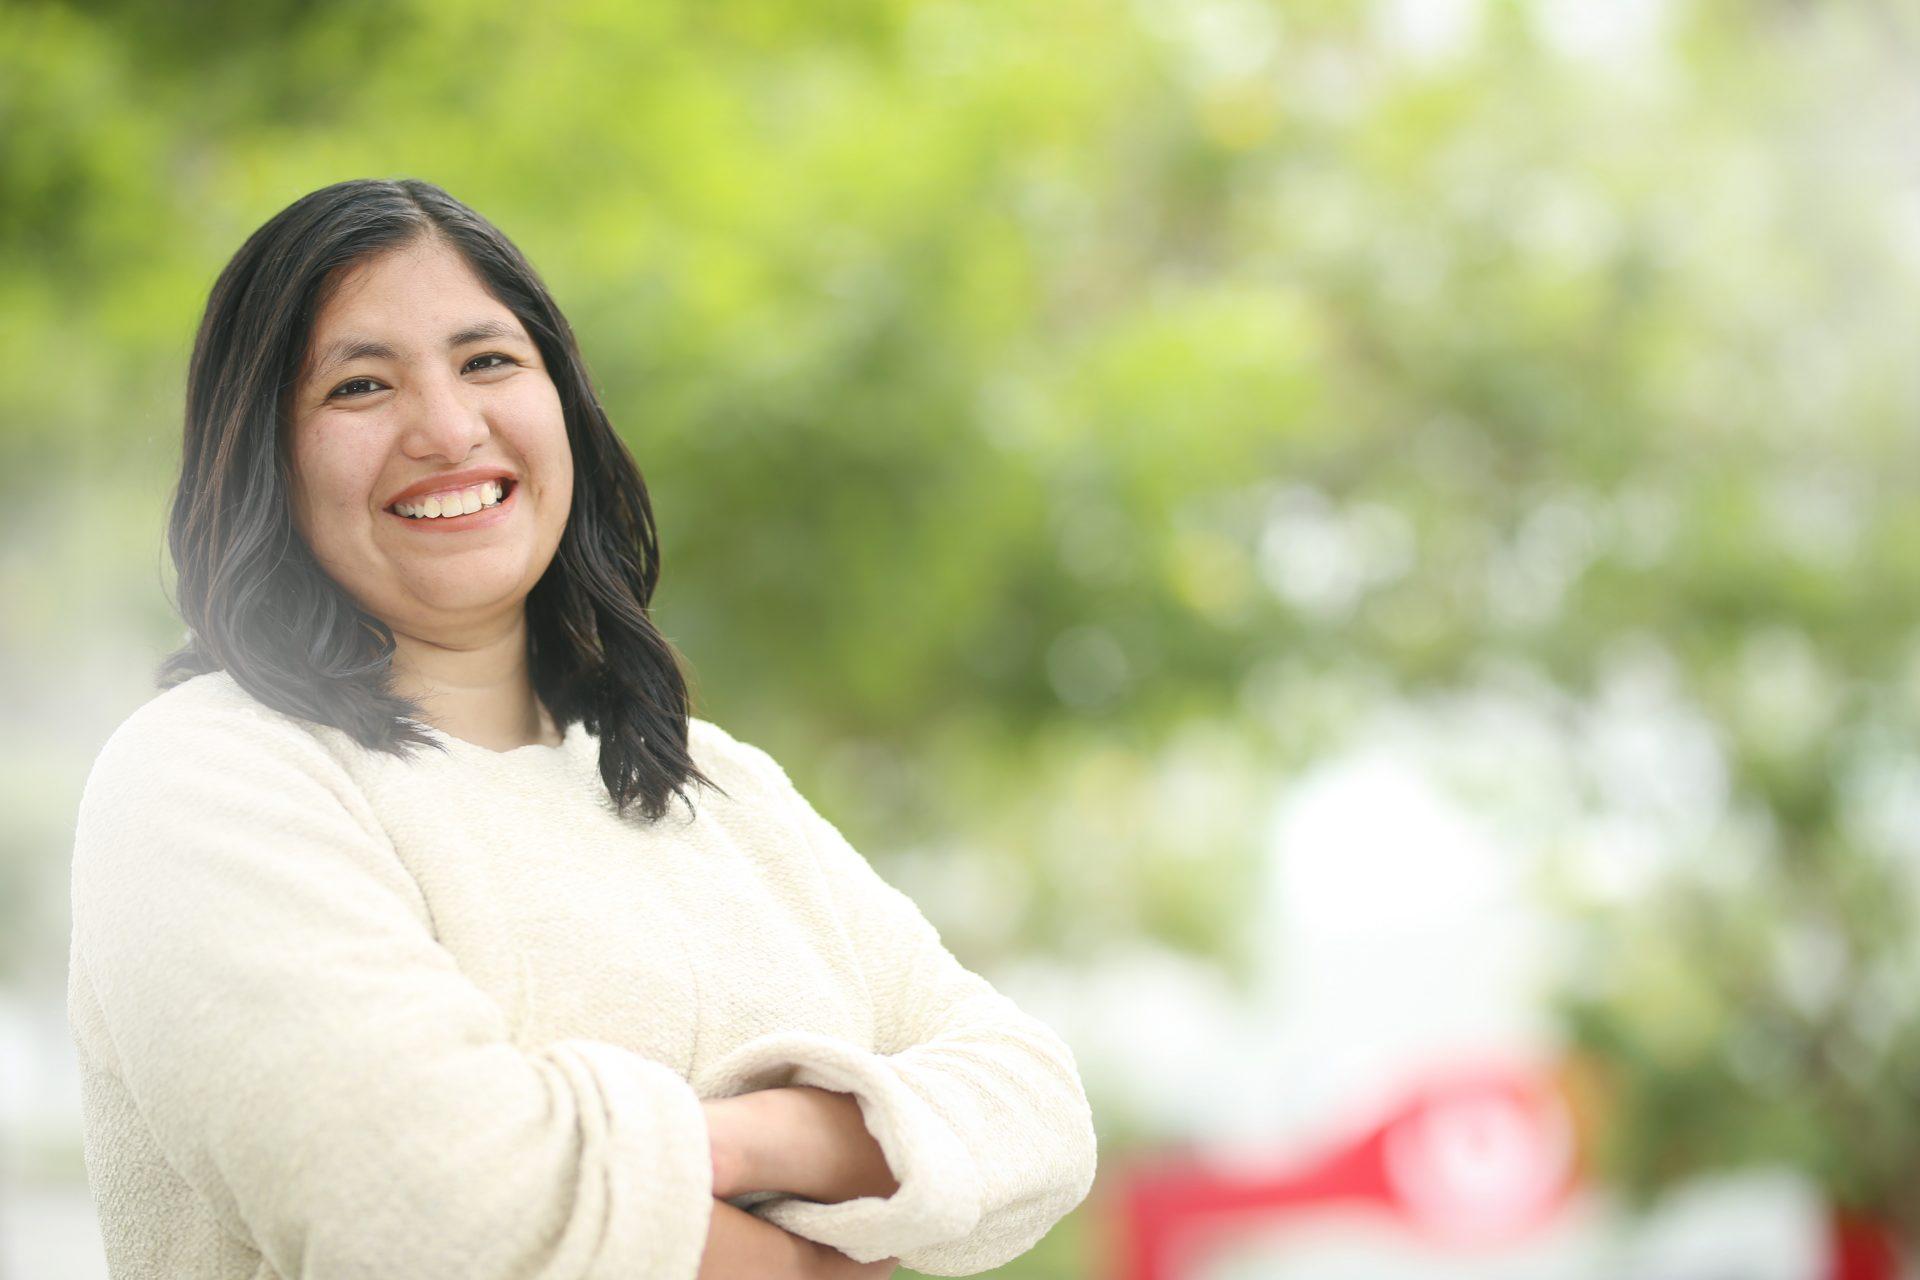 Awajkuna, emprendimiento que empodera a las mujeres peruanas